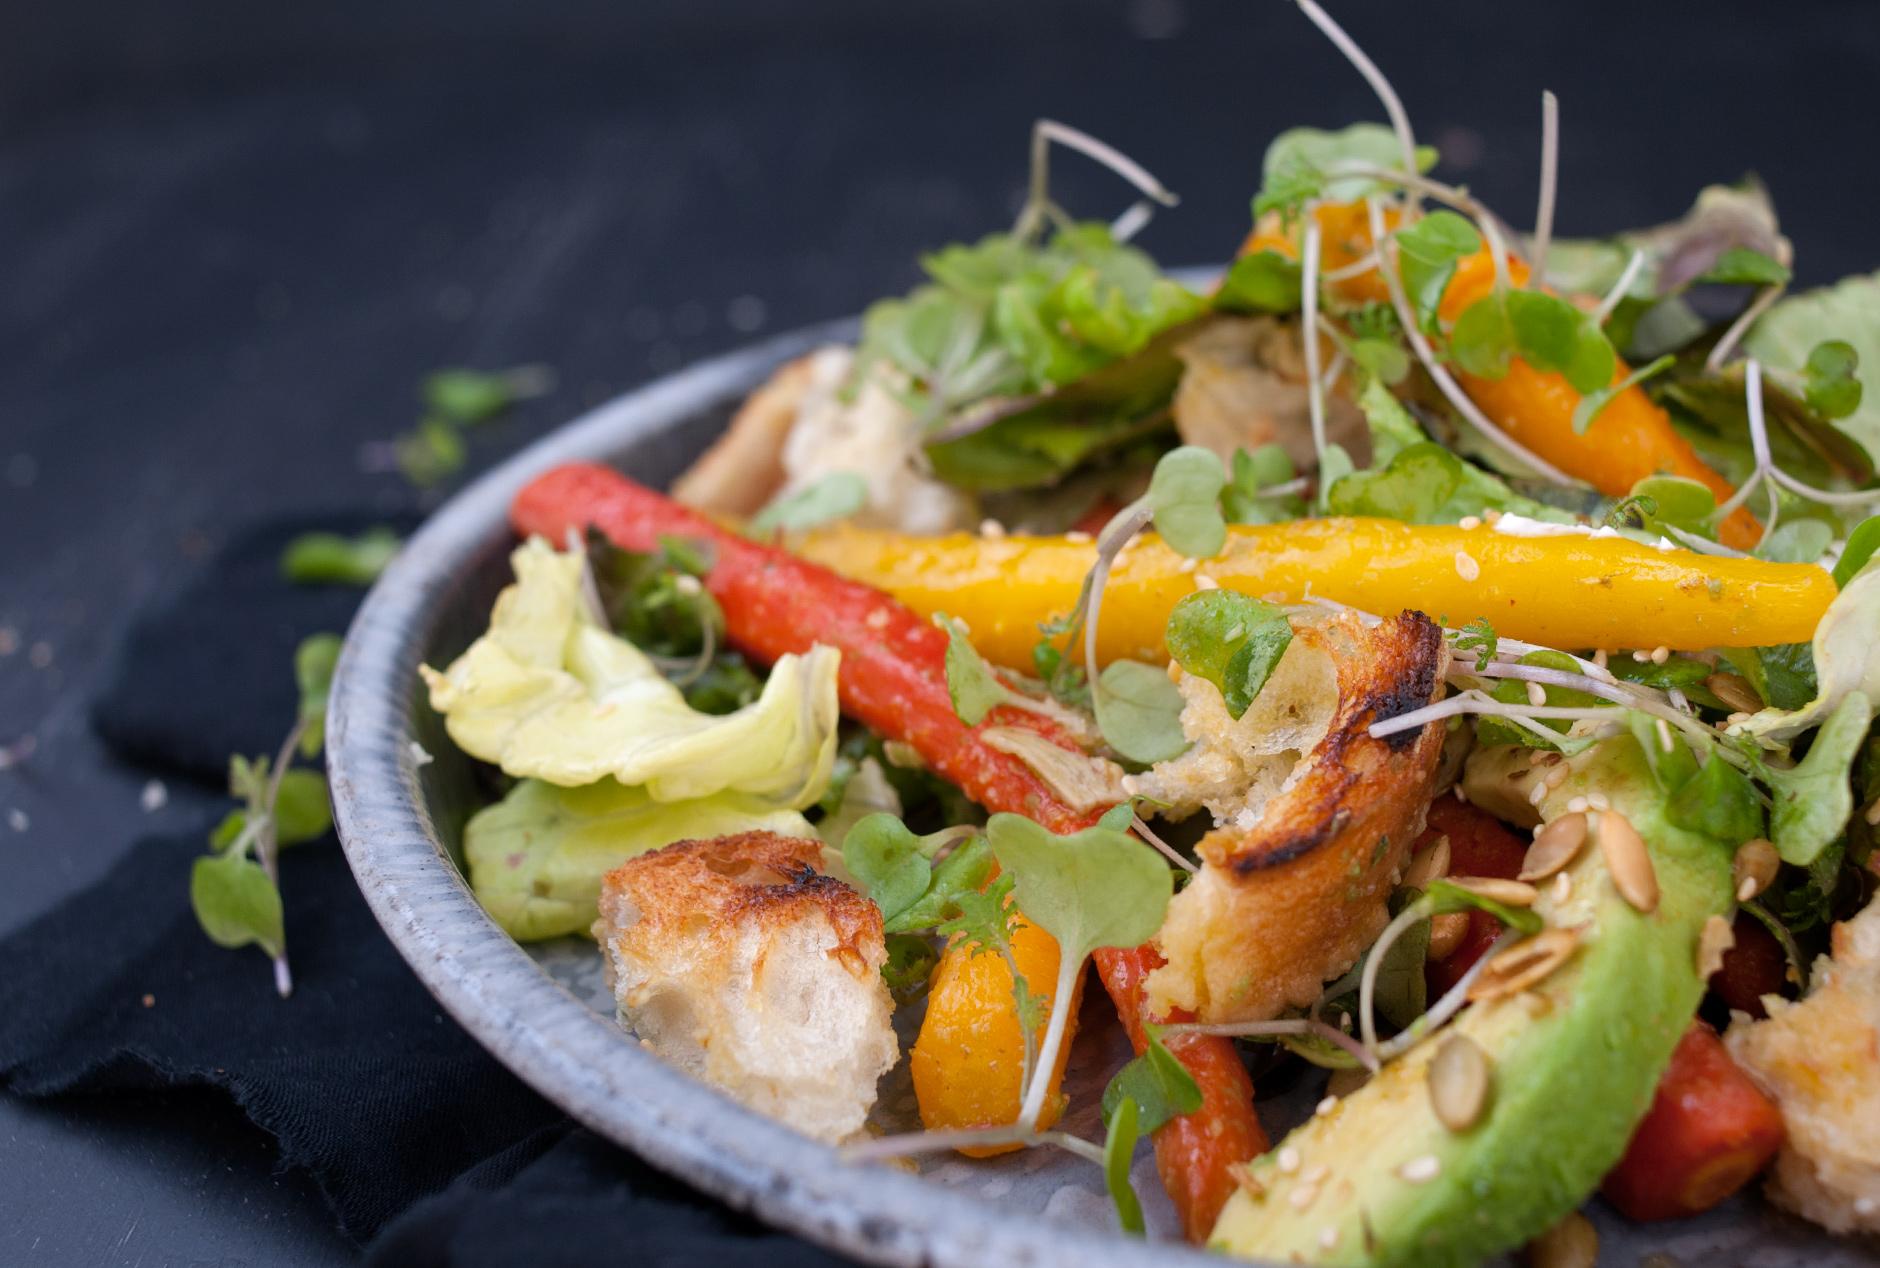 CarrotSalad_food_photography_2.jpg